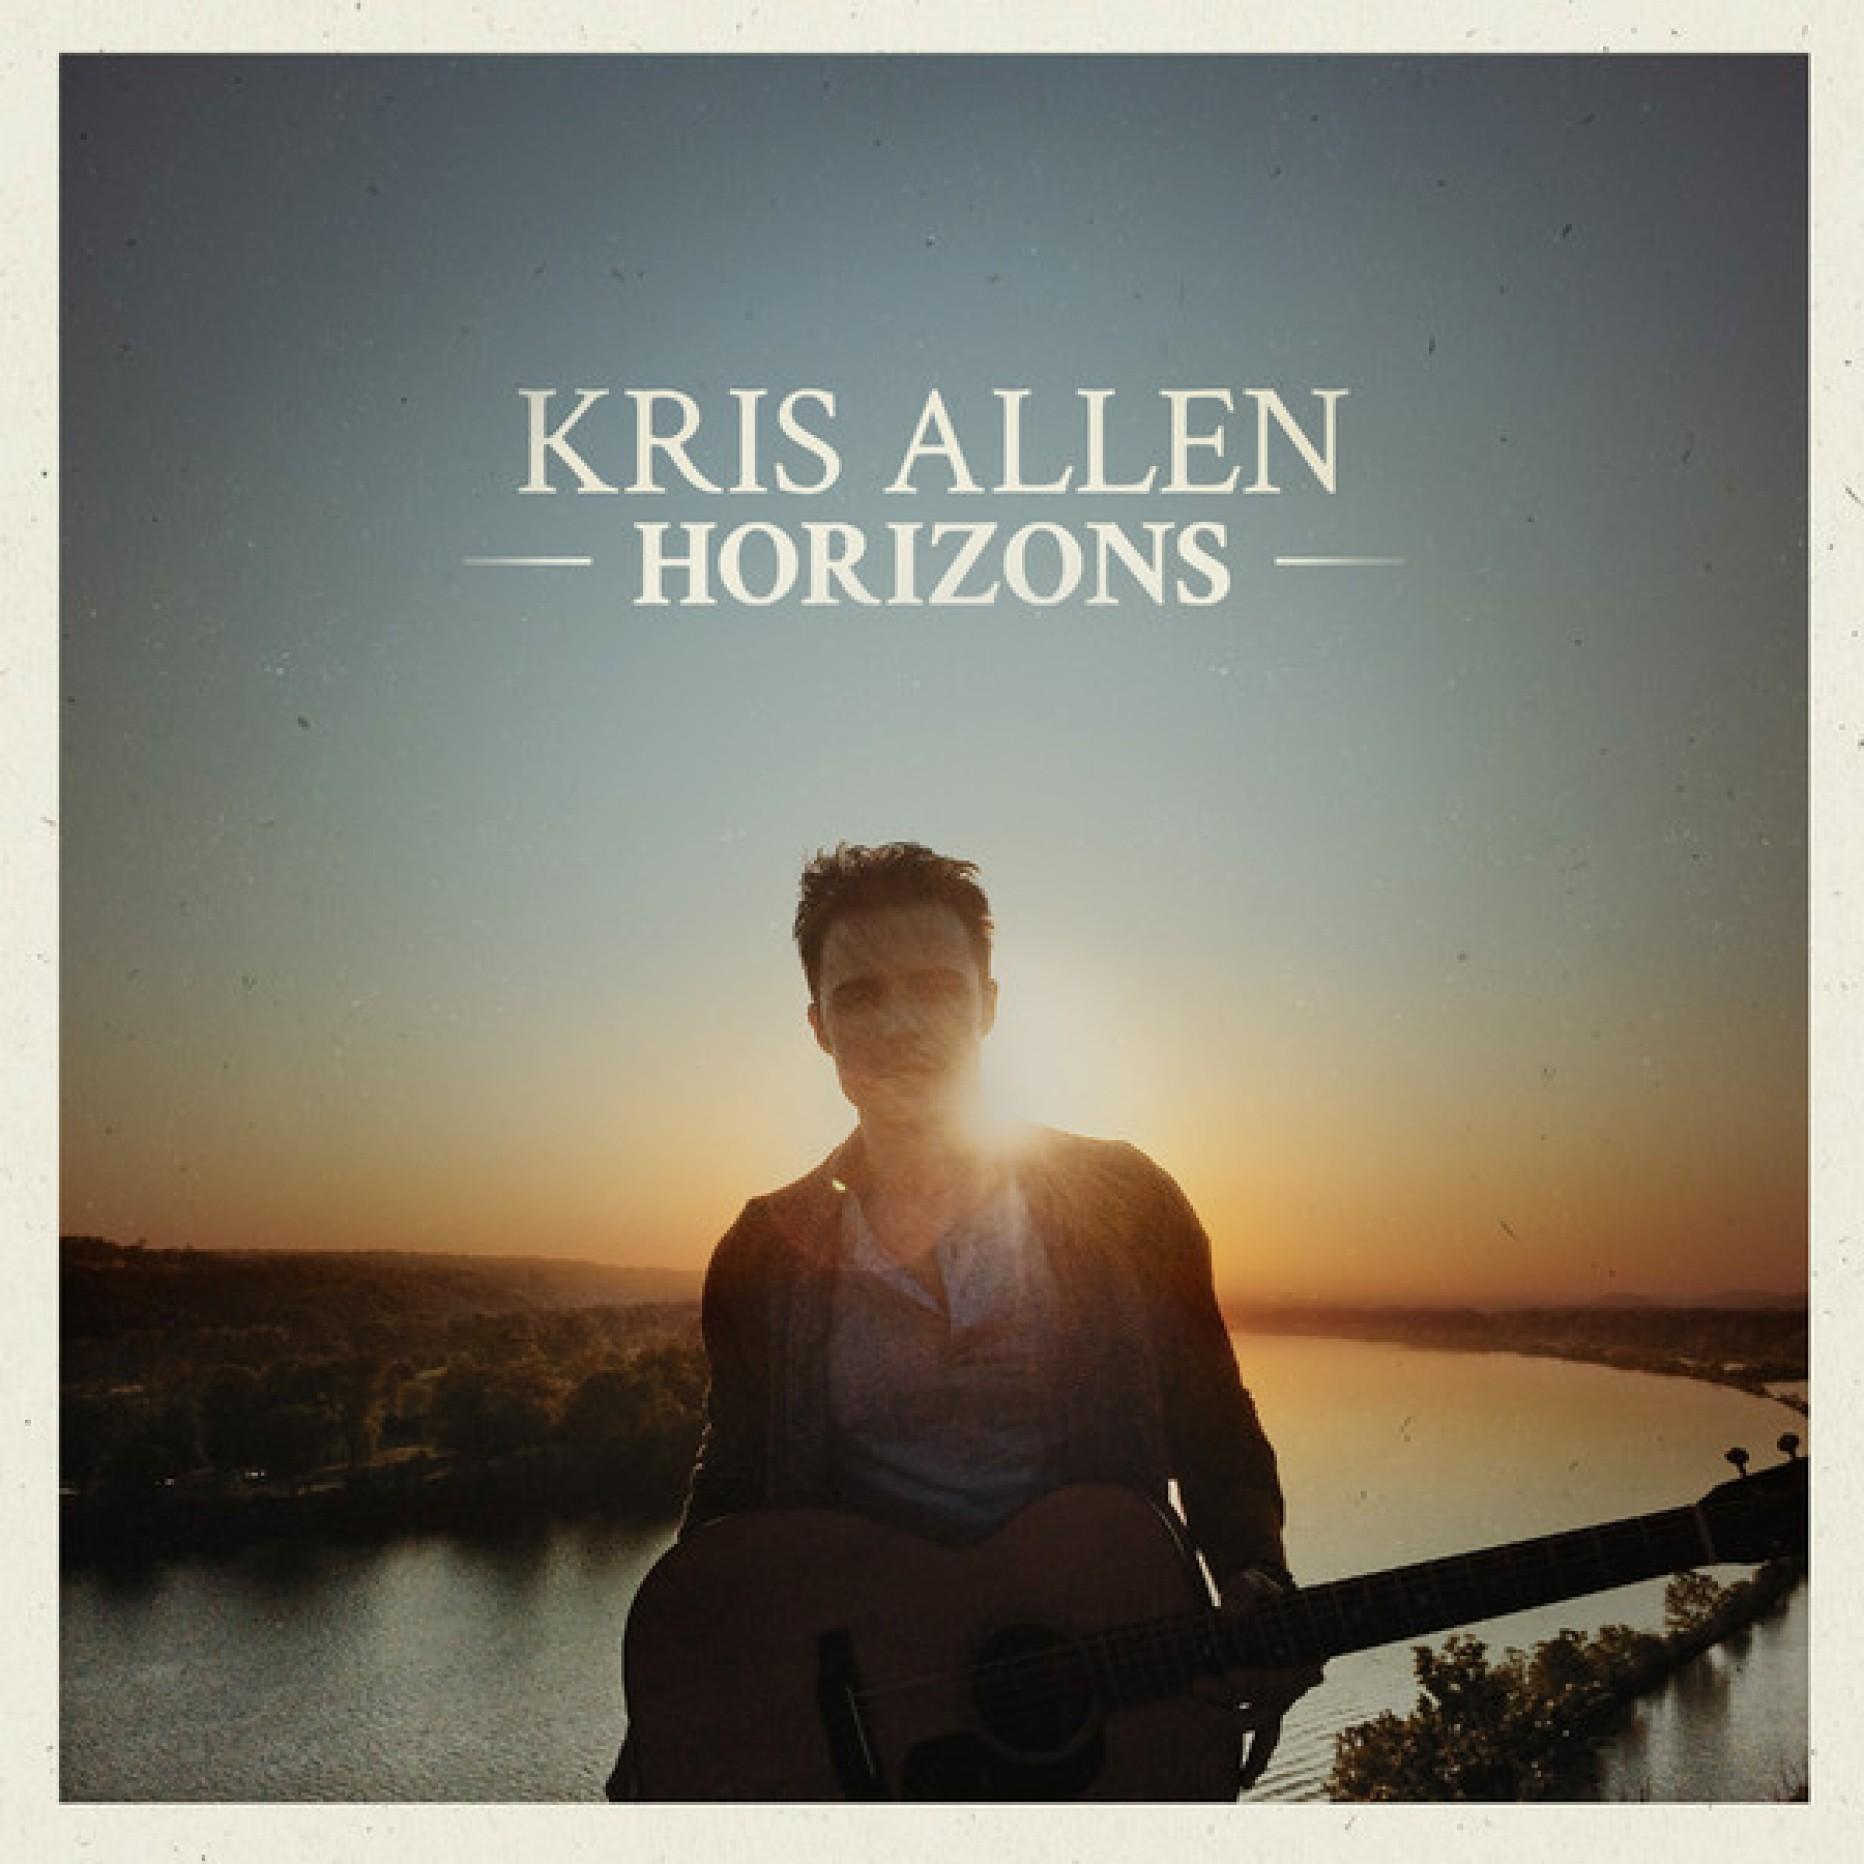 Kris Allen – Horizons Album Review